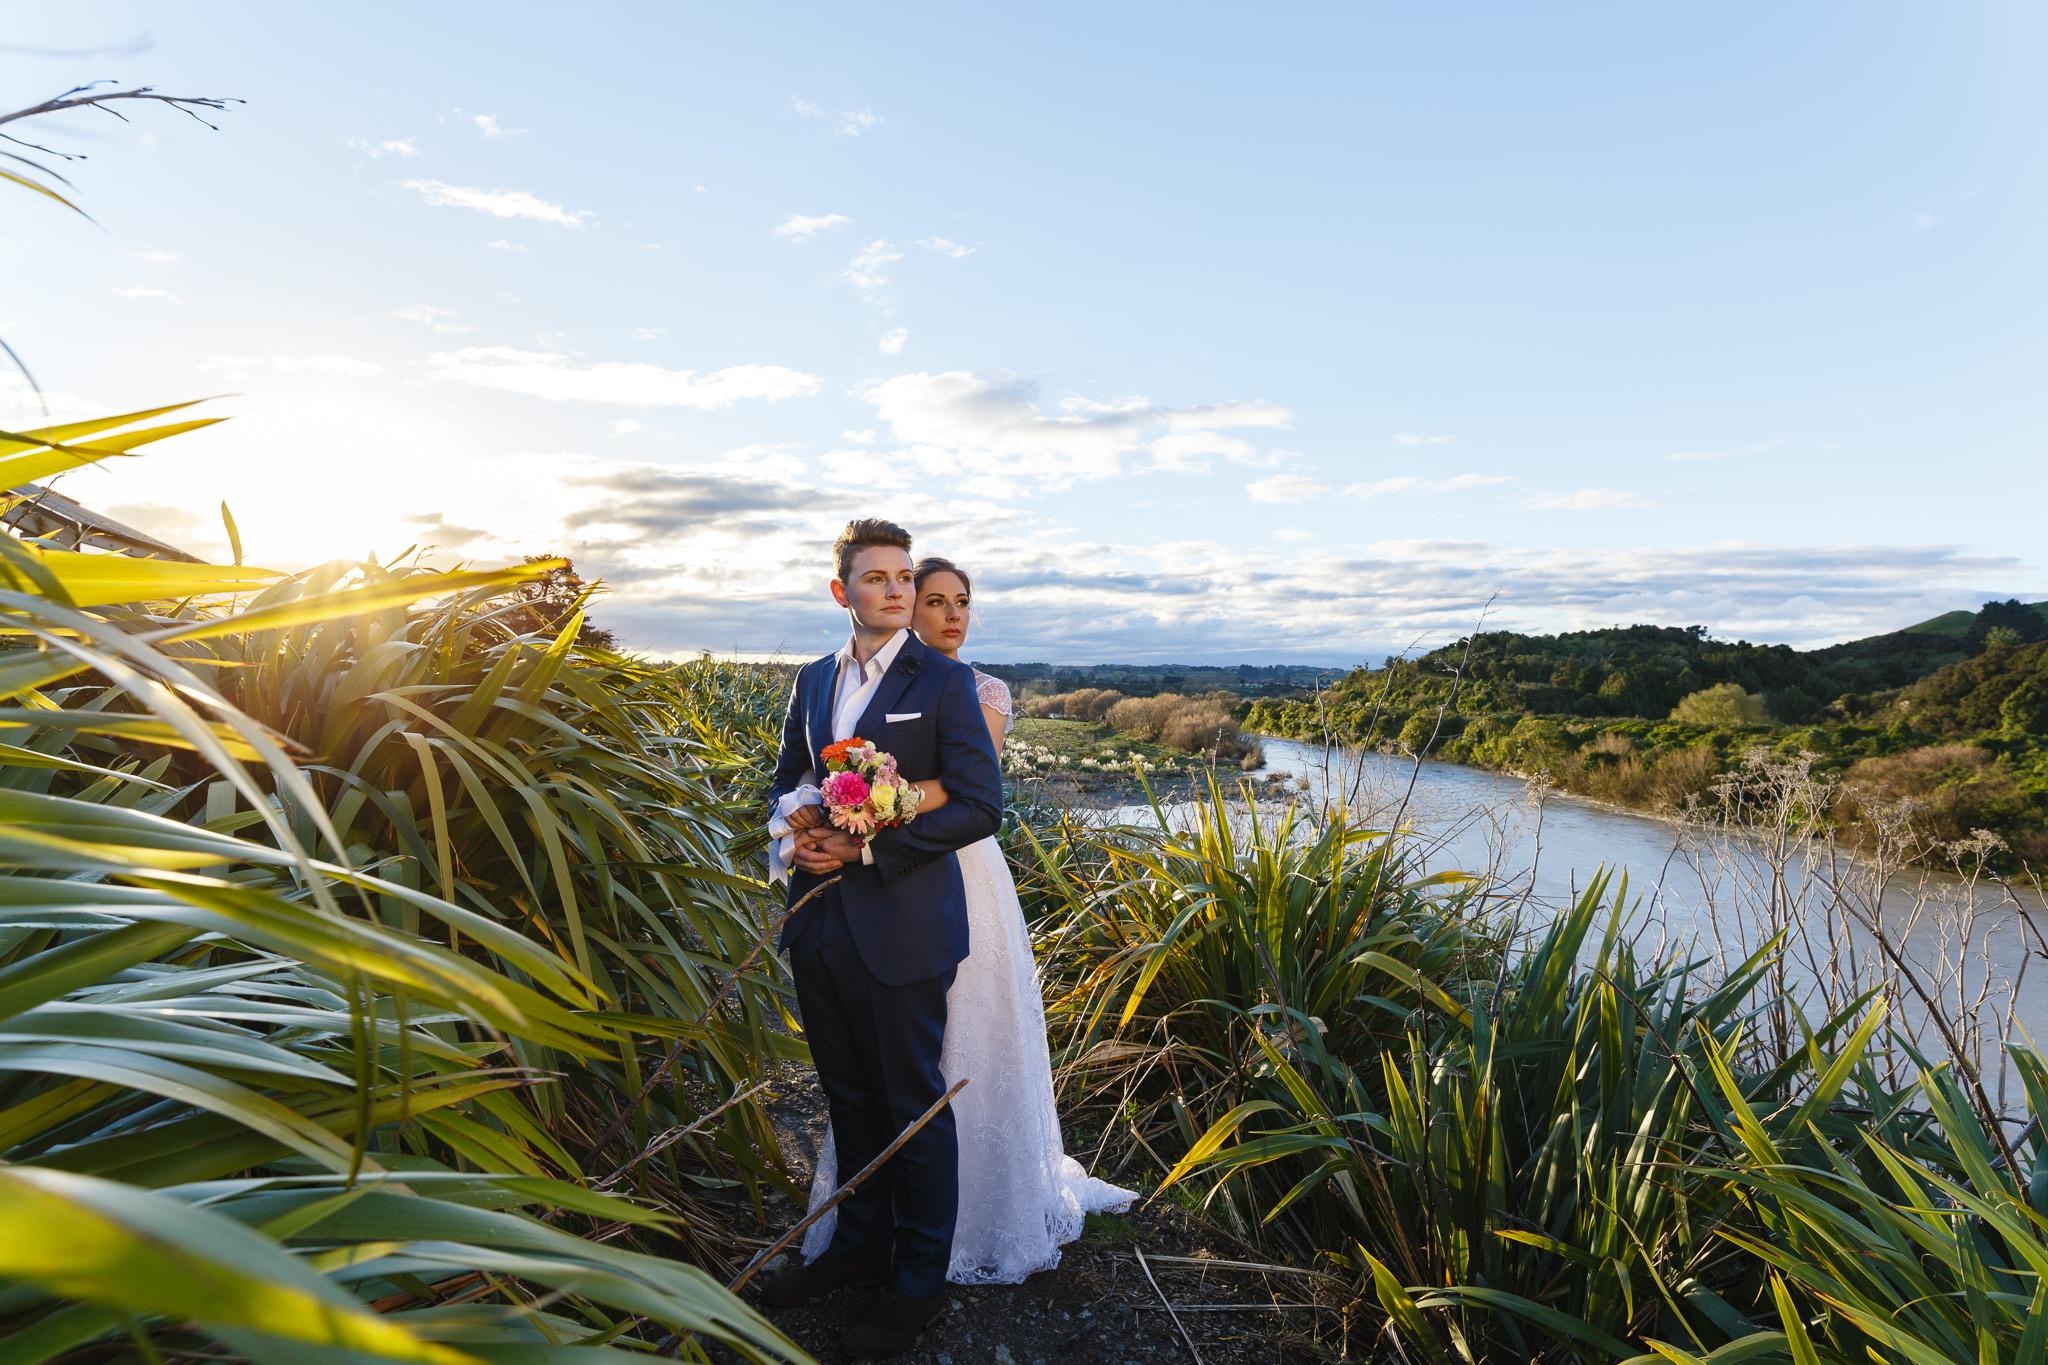 palmerston-north-wedding-photography-highlight-new-zealand.jpg-531.jpg